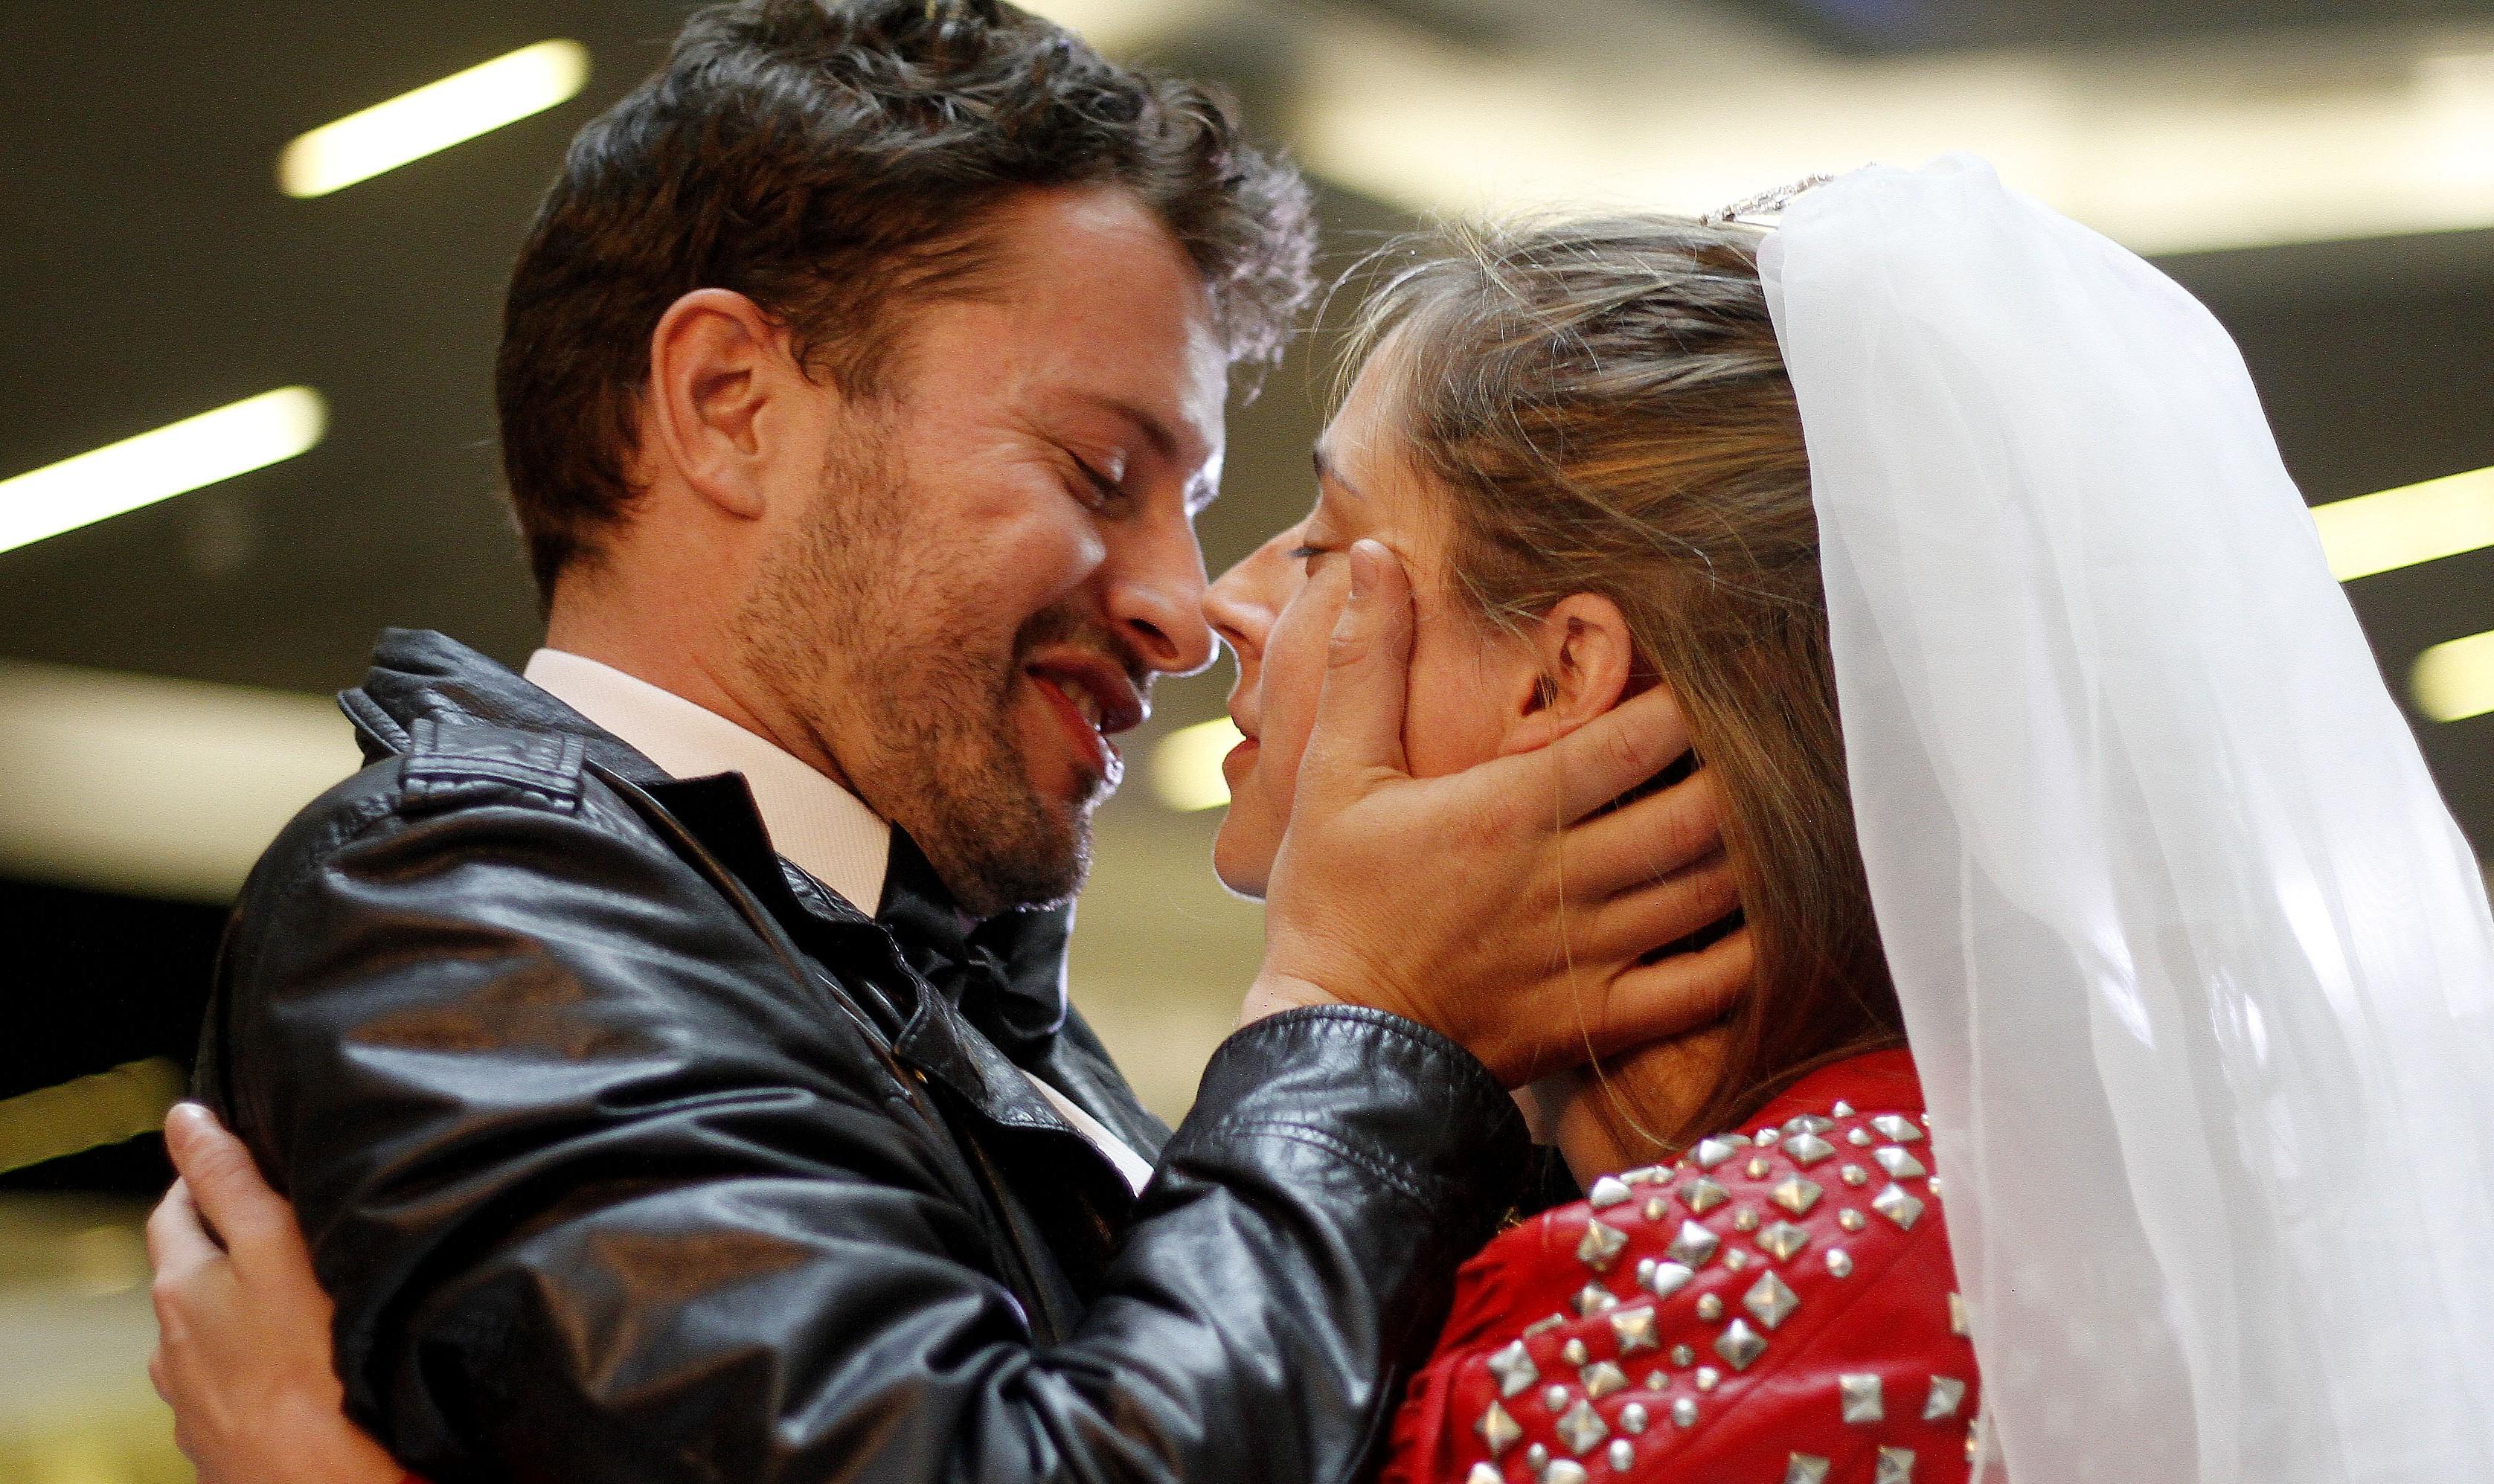 Matrimonio Simbolico Las Vegas : Ex actriz de chv se casa simbólicamente en capilla estilo u clas